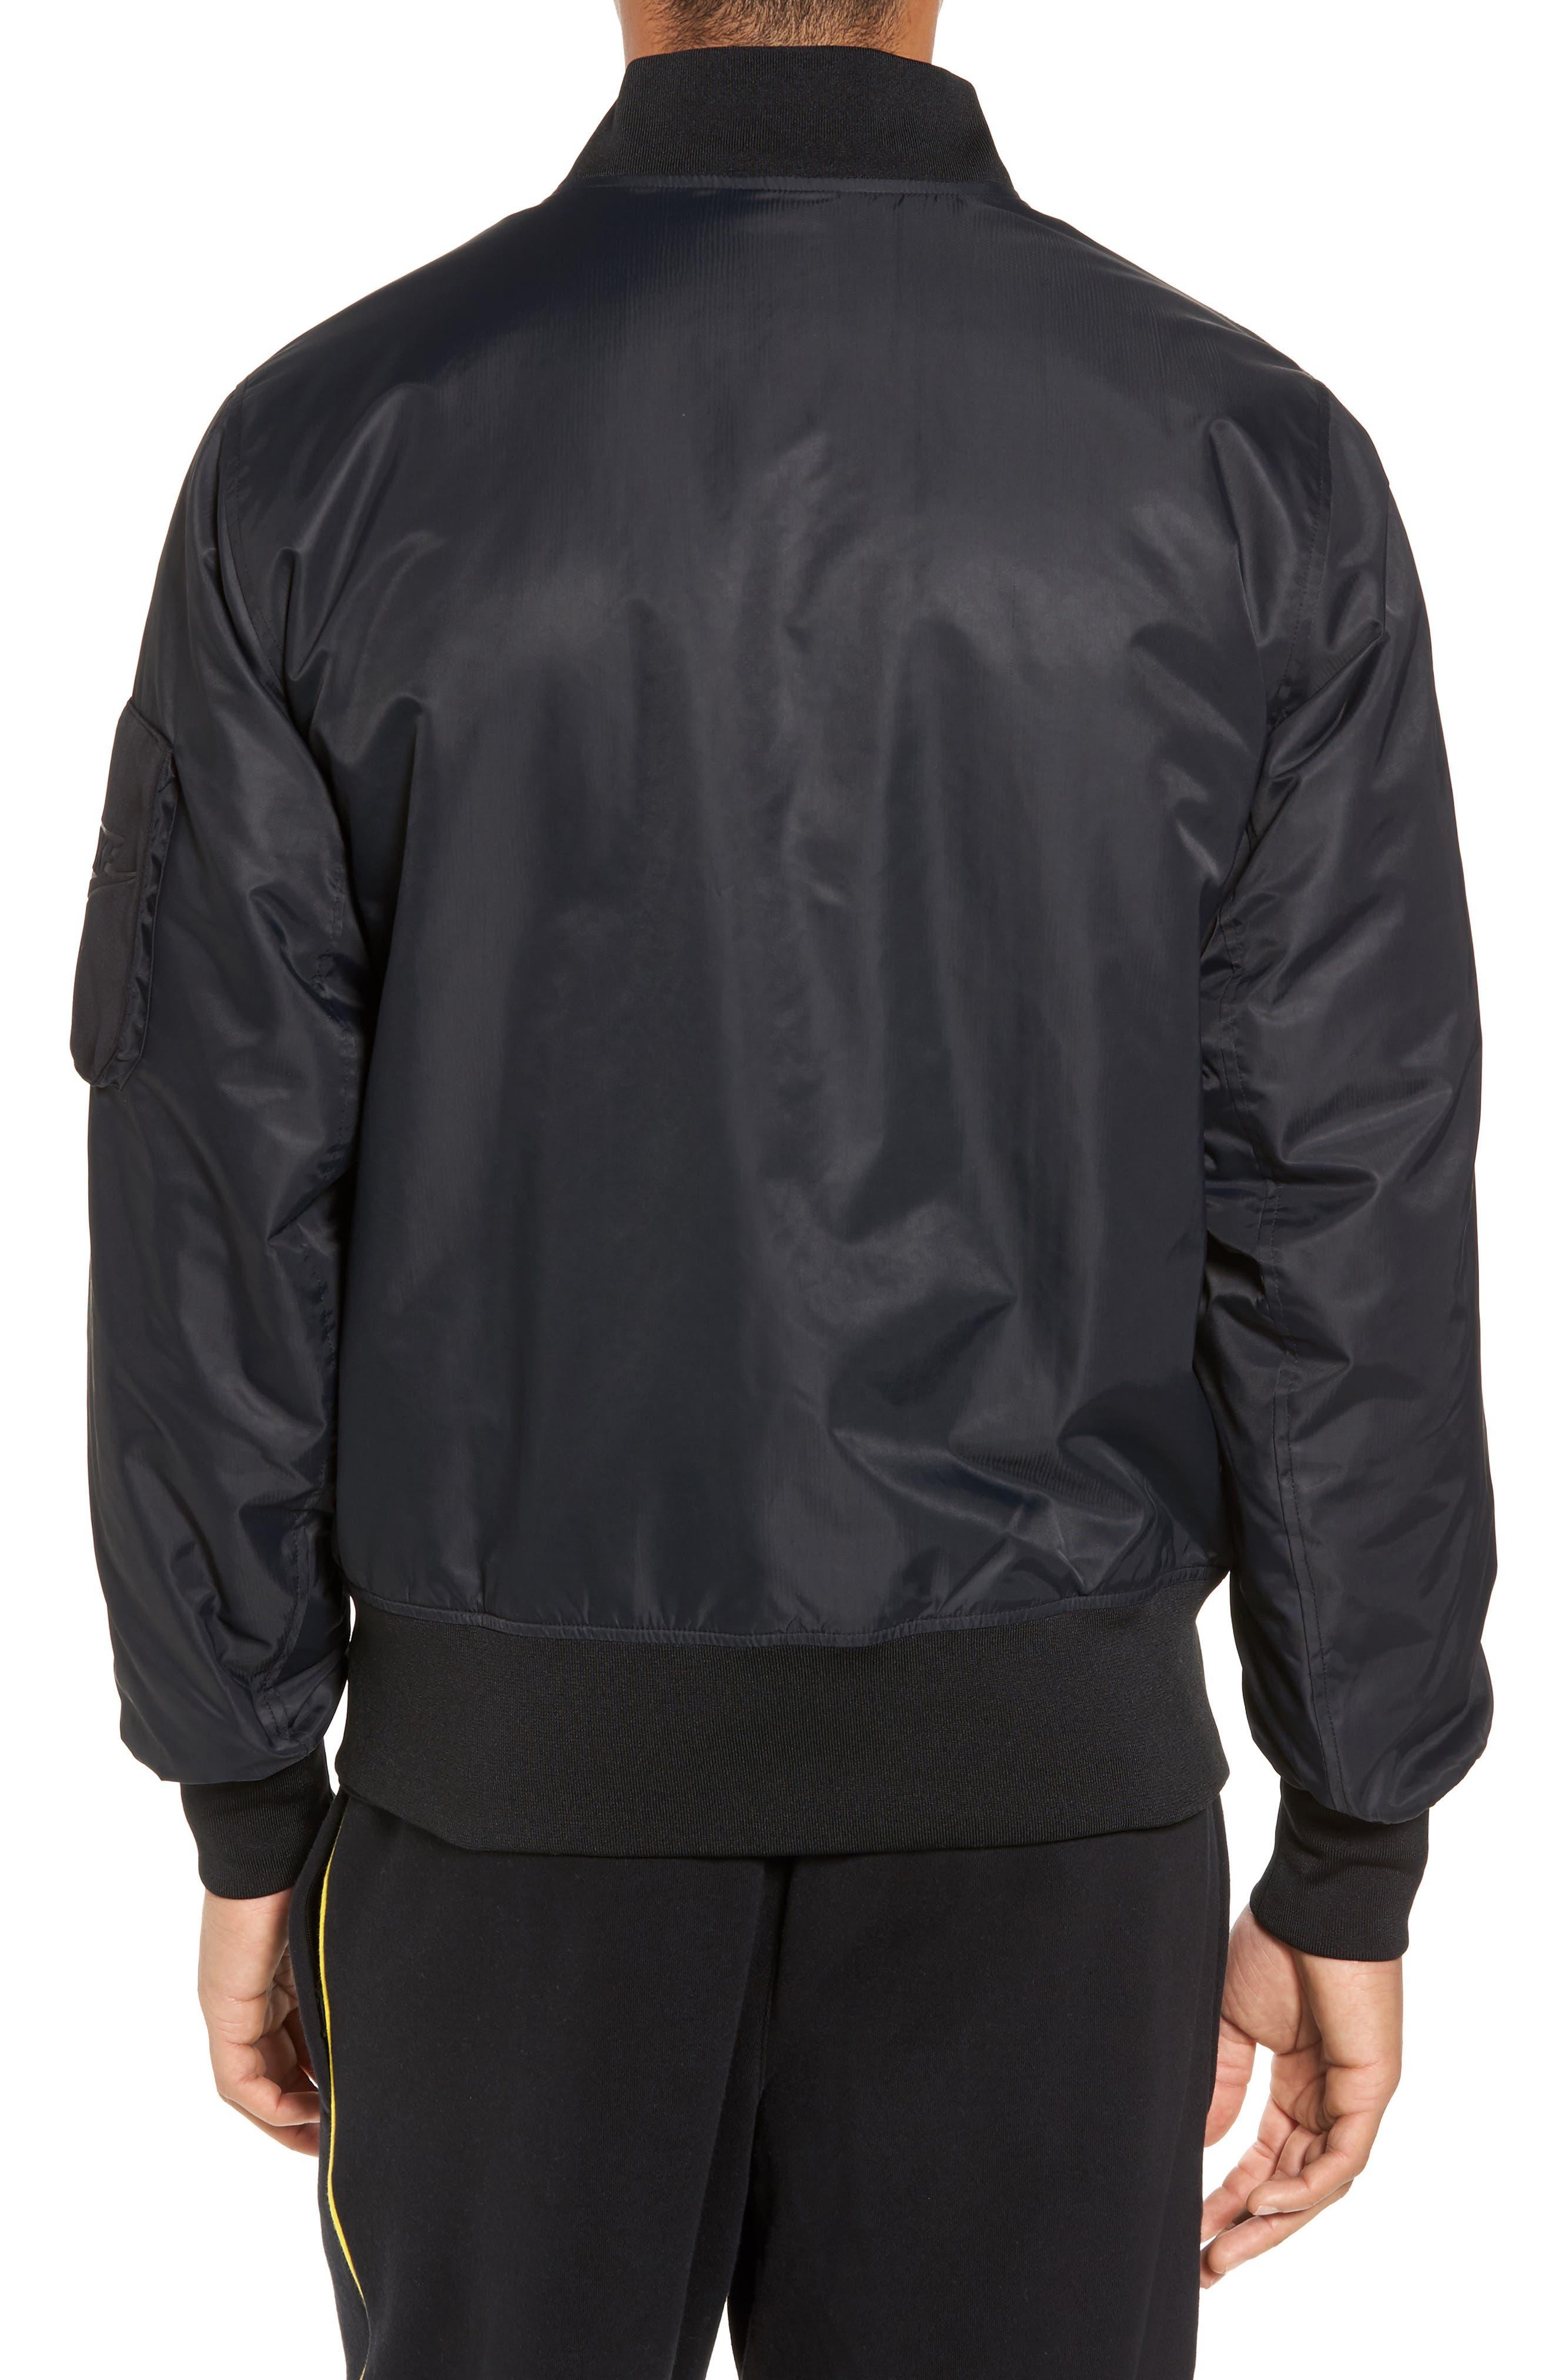 NSW Air Max Woven Bomber Jacket,                             Alternate thumbnail 3, color,                             Black/ Black